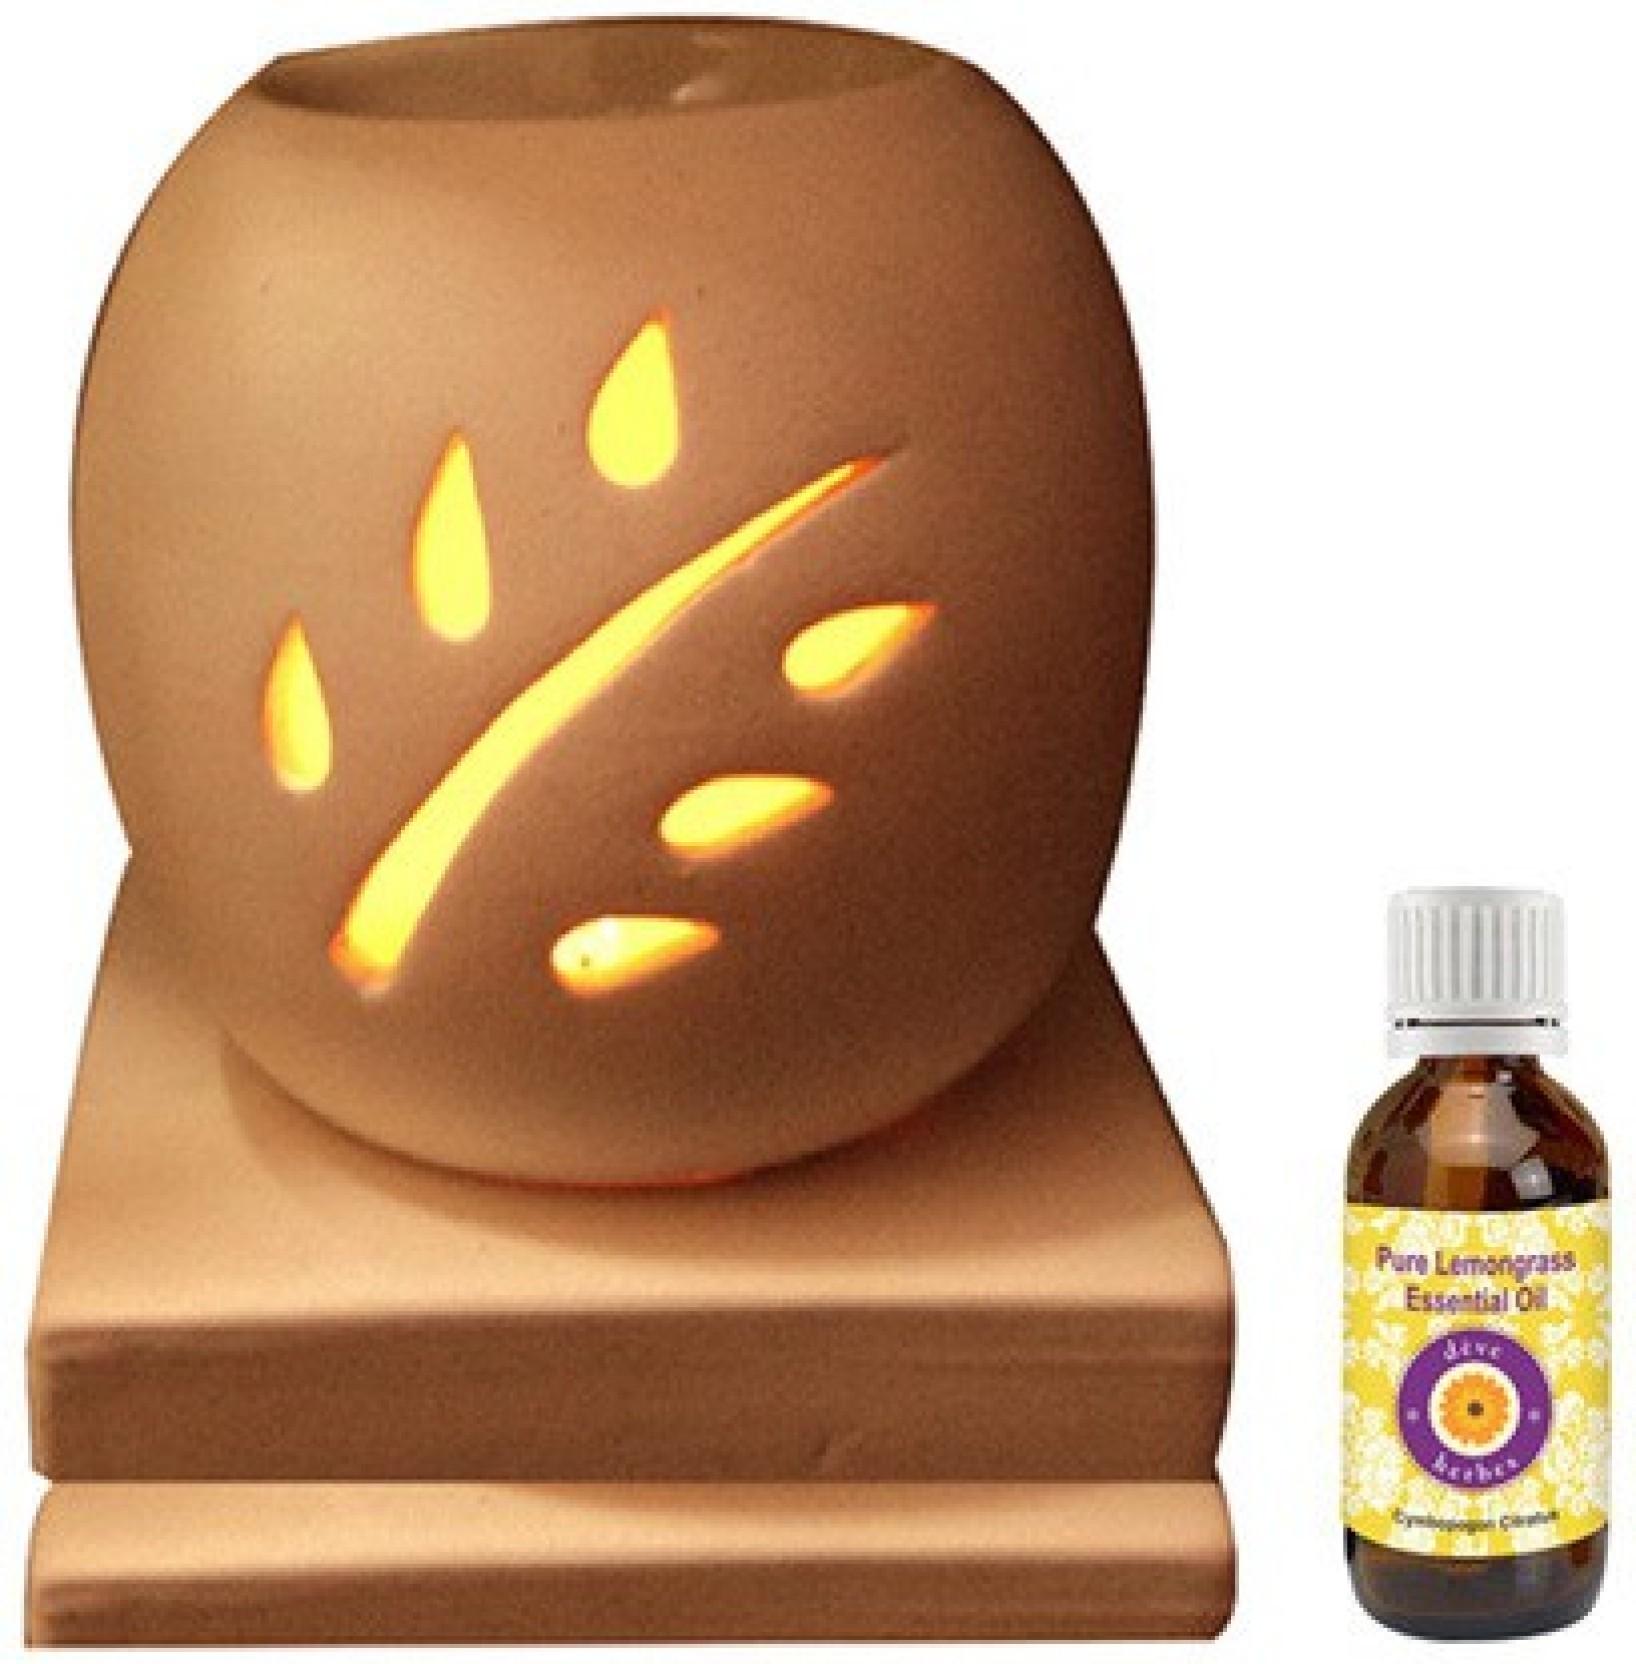 Deve Herbes Lemongrass Oil Aroma Oil Diffuser Set Price in India